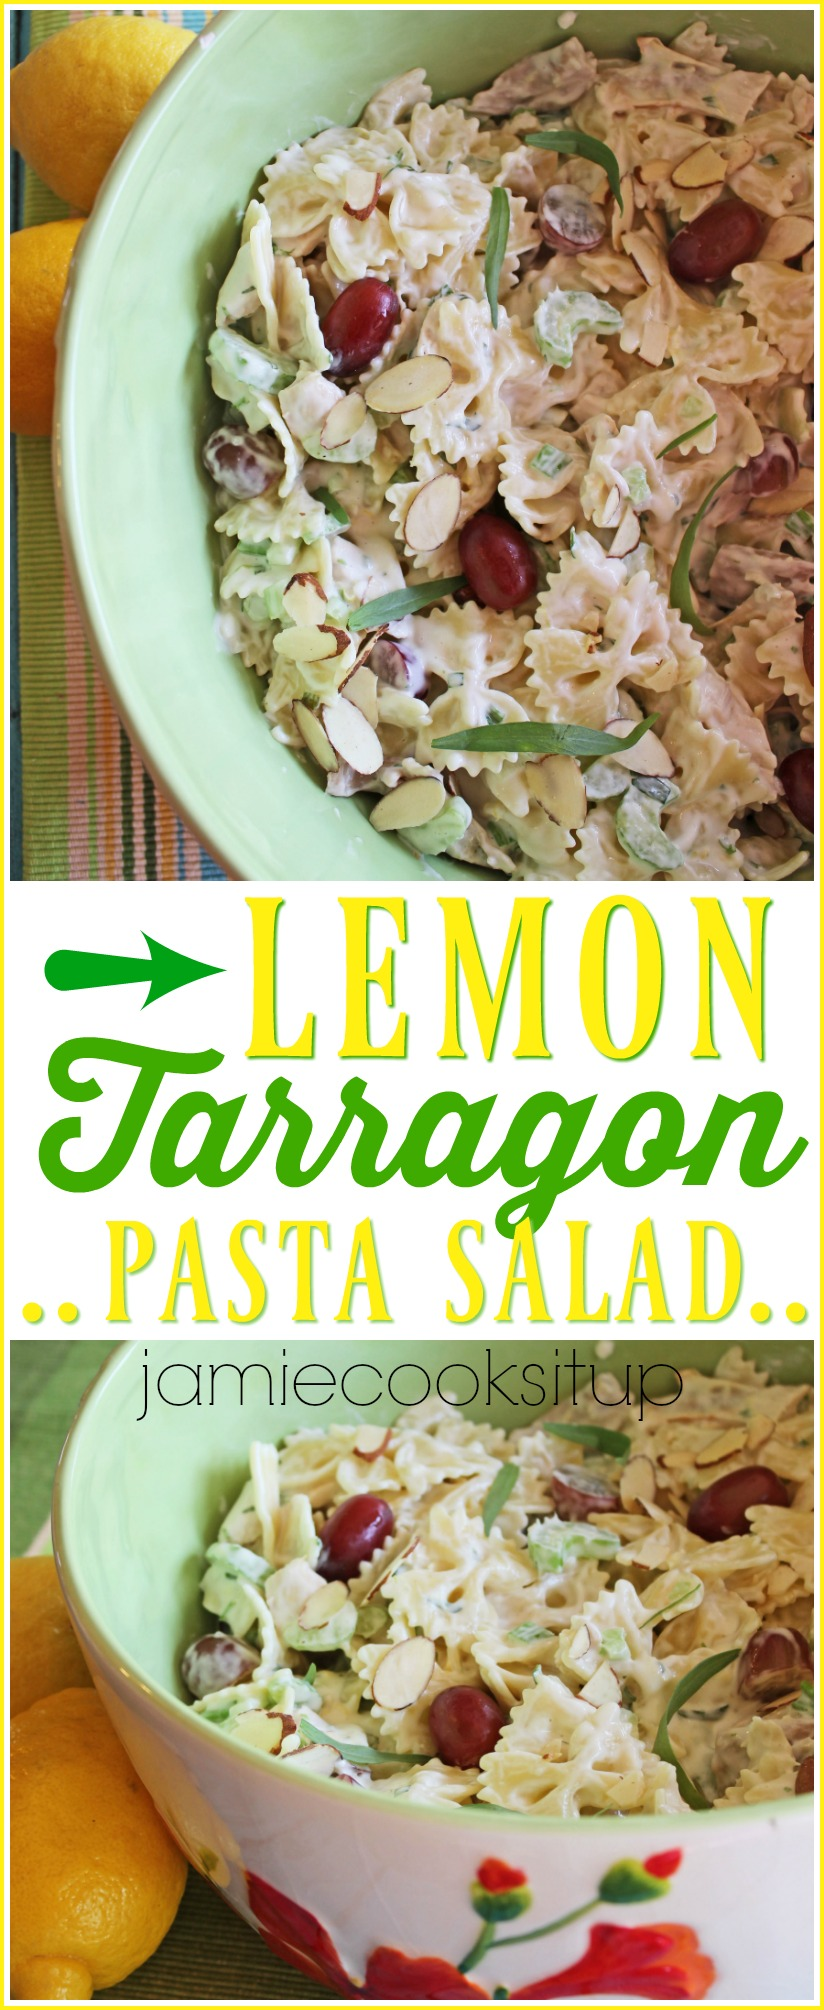 lemon-tarragon-pasta-salad-from-jamie-cooks-it-up